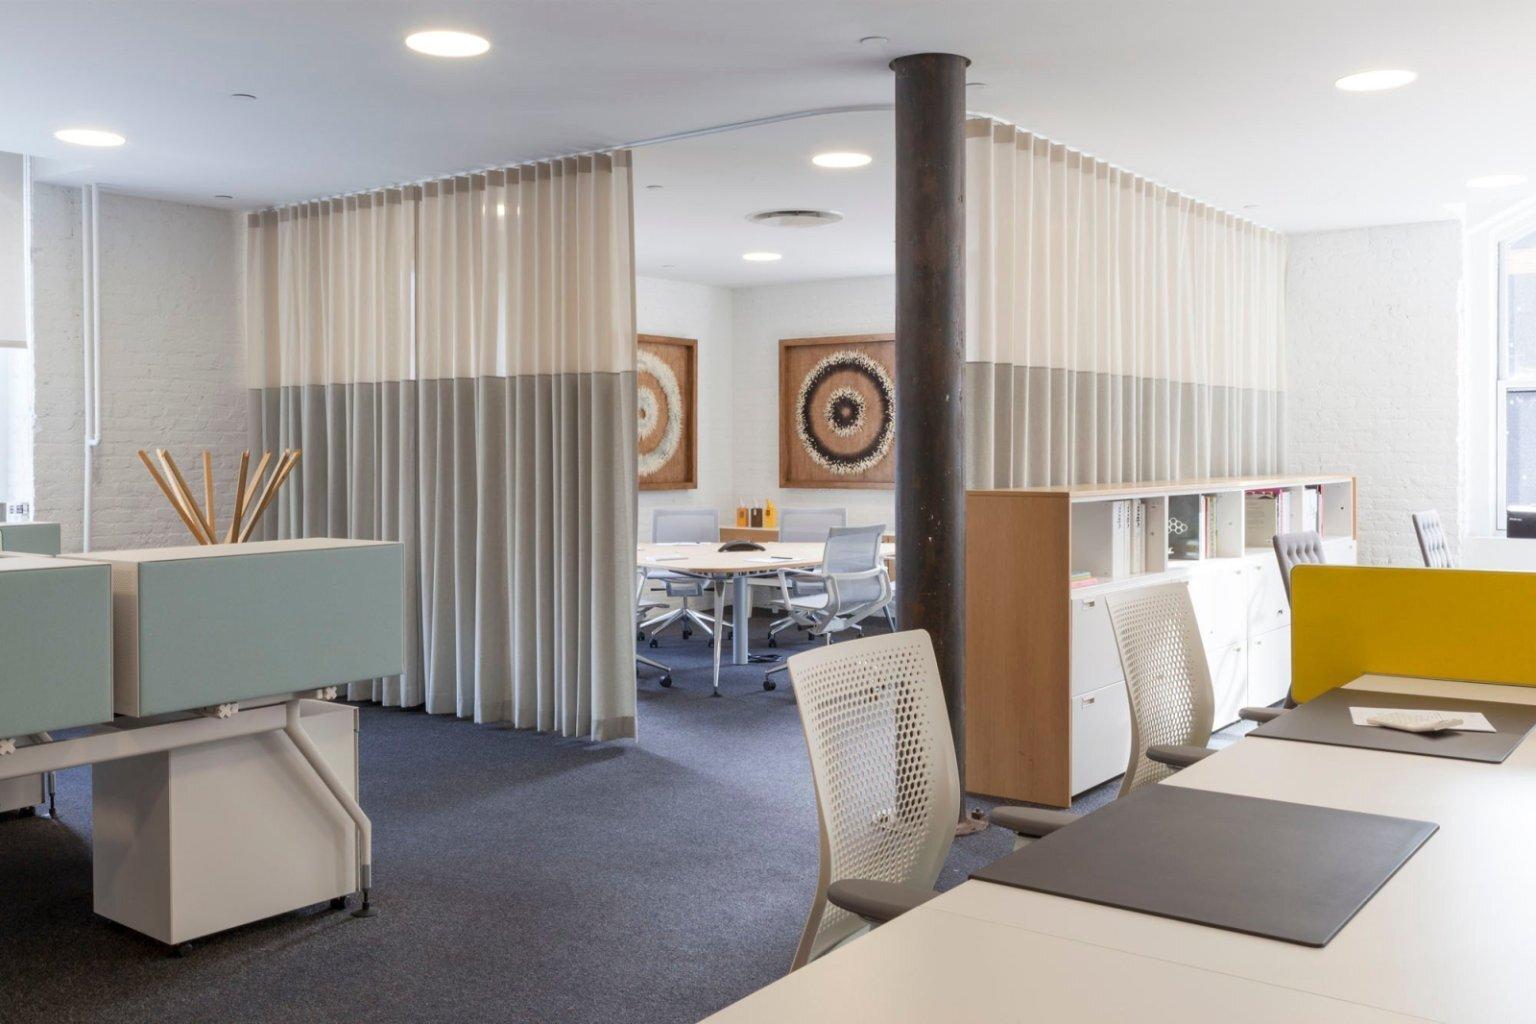 Full Size of Raumteiler Kinderzimmer Ikea Vorhange Regal Sofa Weiß Regale Kinderzimmer Raumteiler Kinderzimmer